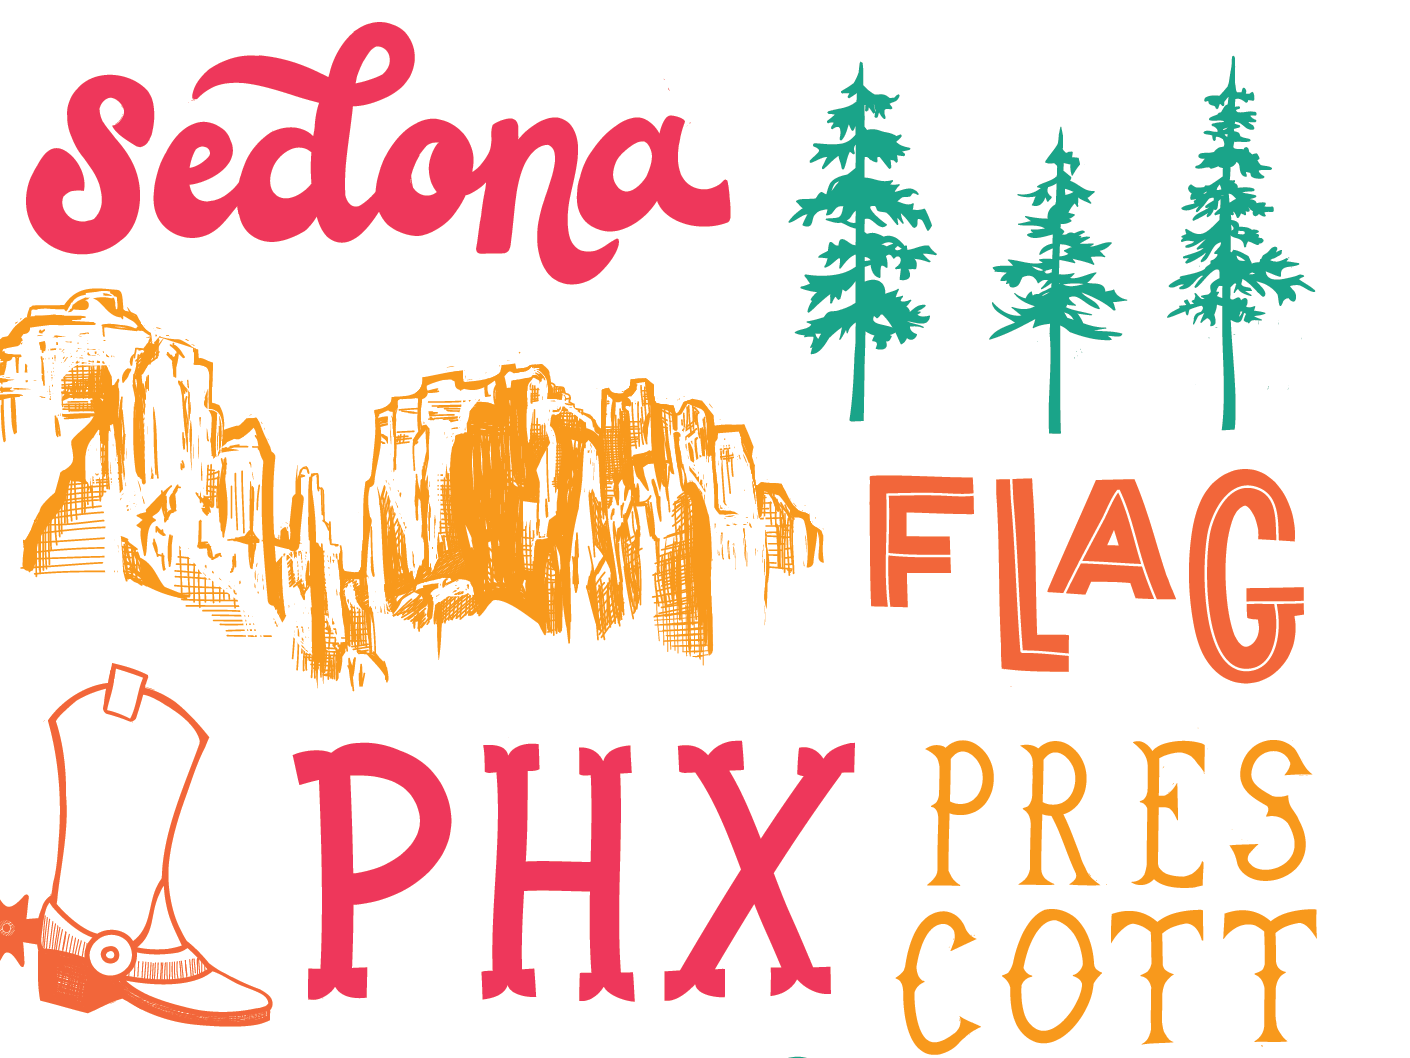 Arizona adobe illustrator adobe draw illustrator type hand lettering lettering az flagstaff west coast western west phoenix scottsdale sedona desert arizona typography vector design illustration